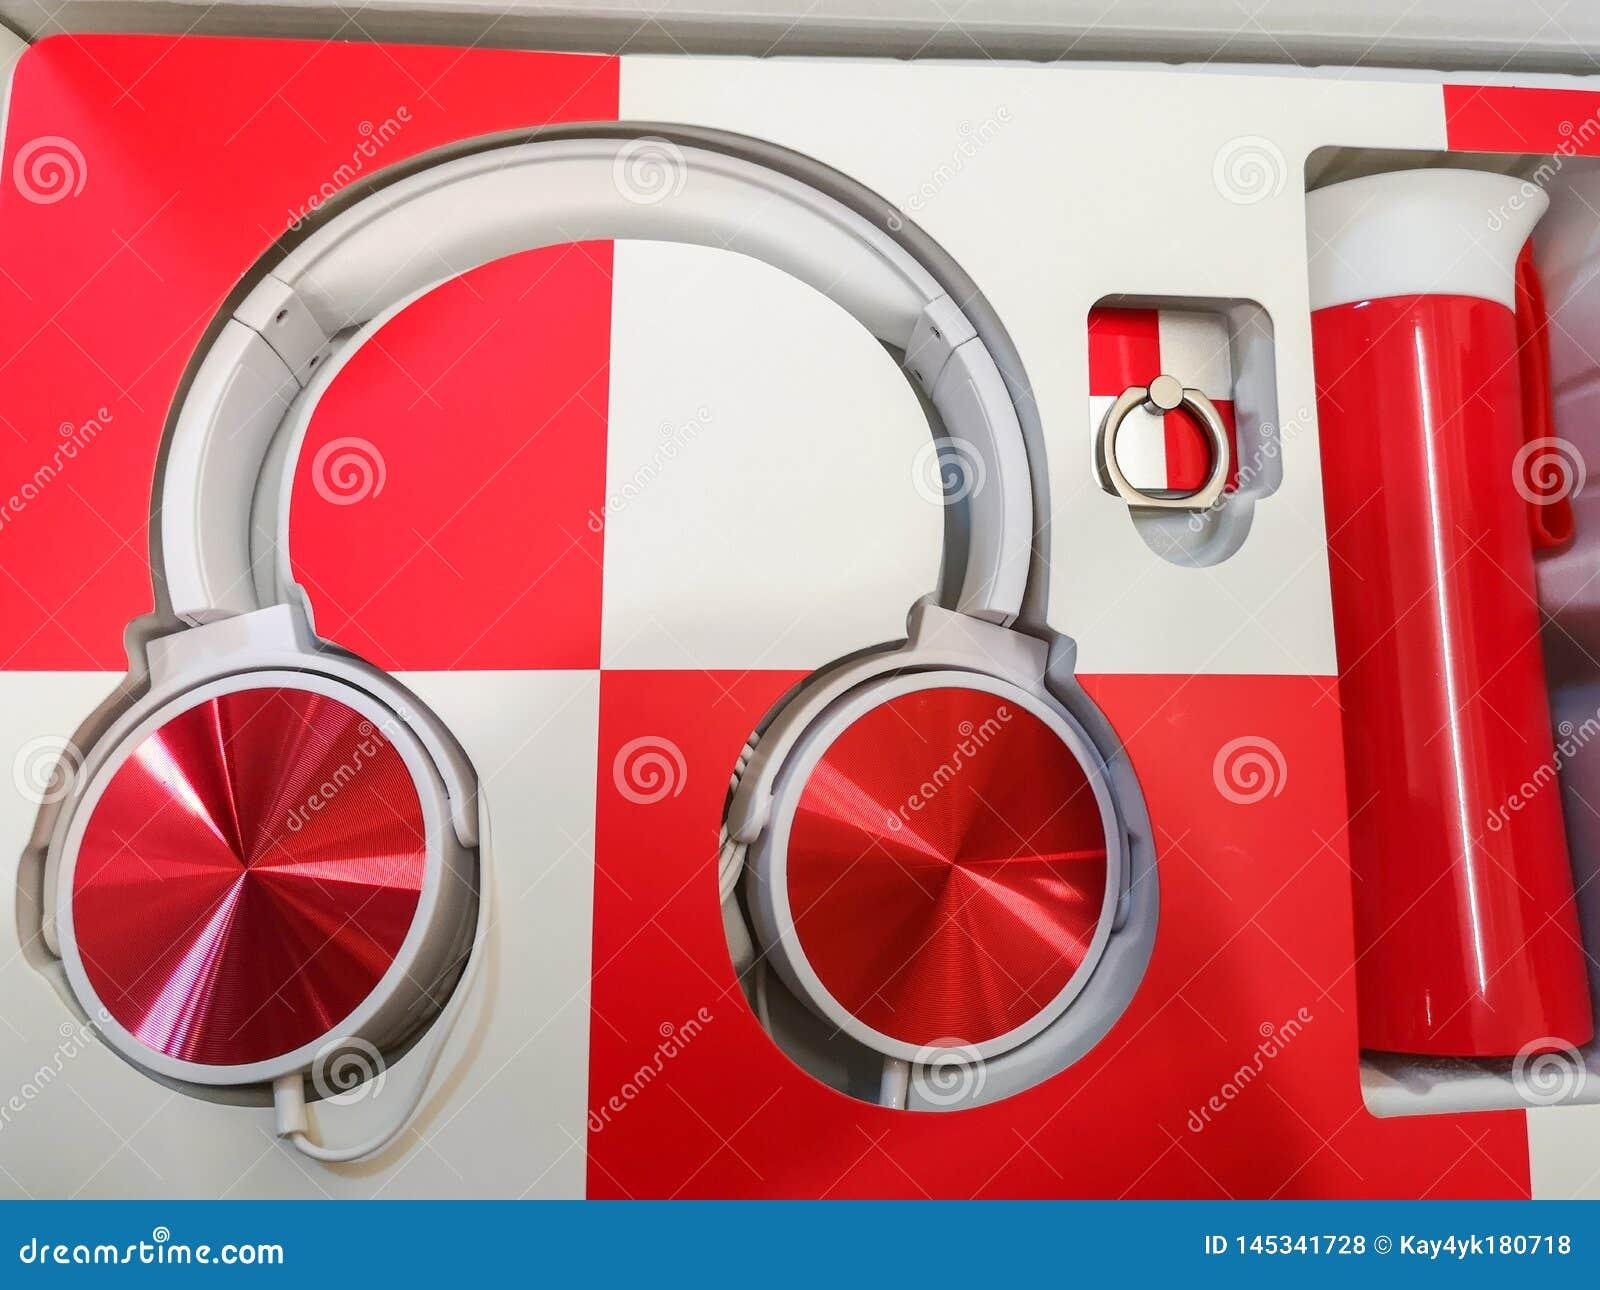 Rood-witte hoofdtelefoons, hoofdtelefoons als gift, Multicolored muziek